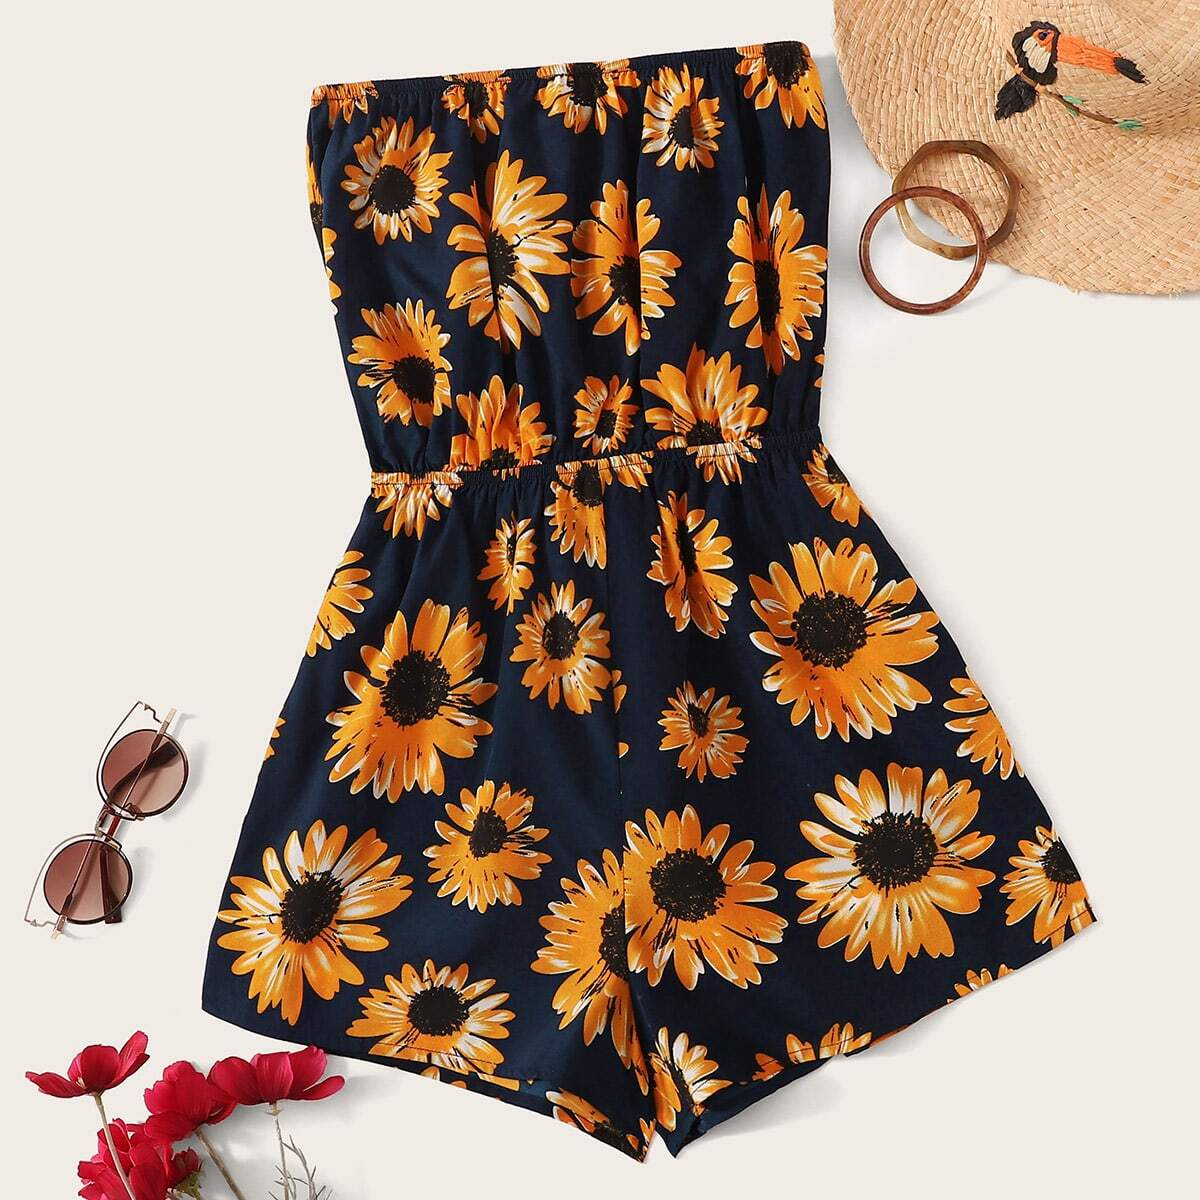 Jumpsuit mit Sonneblume Muster